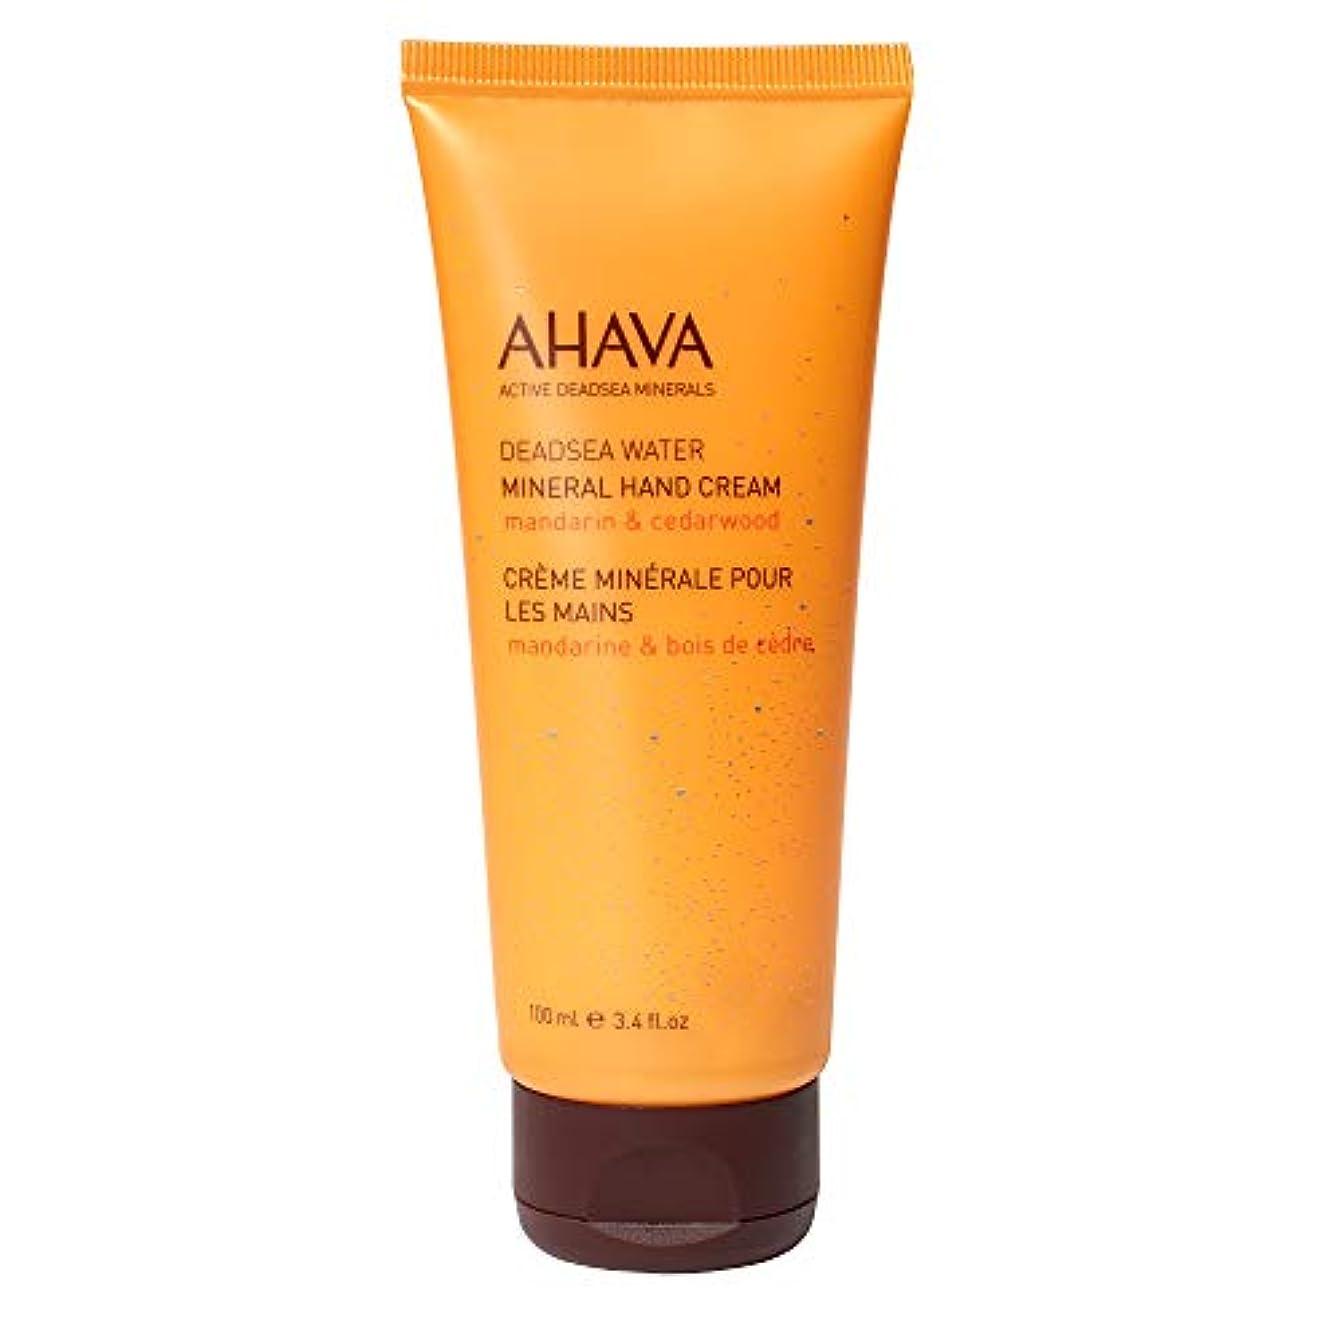 AHAVA - Deadsea Water Mineral Hand Cream Mandarin and Cedarwood